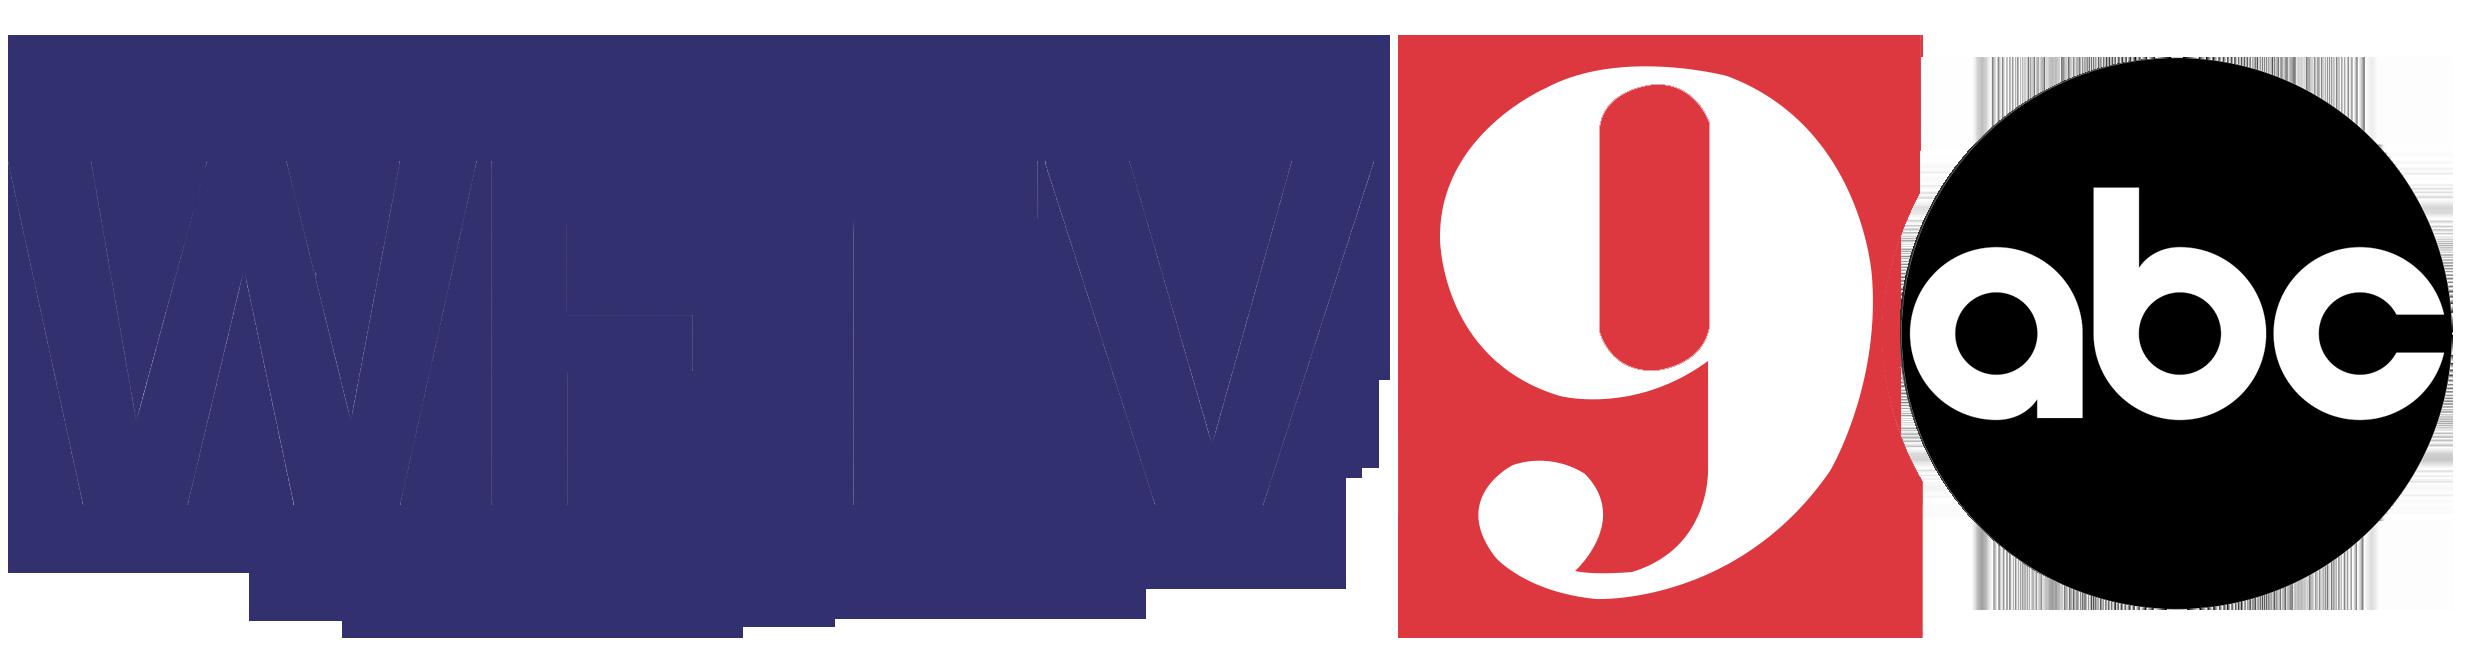 WFTV News Logo